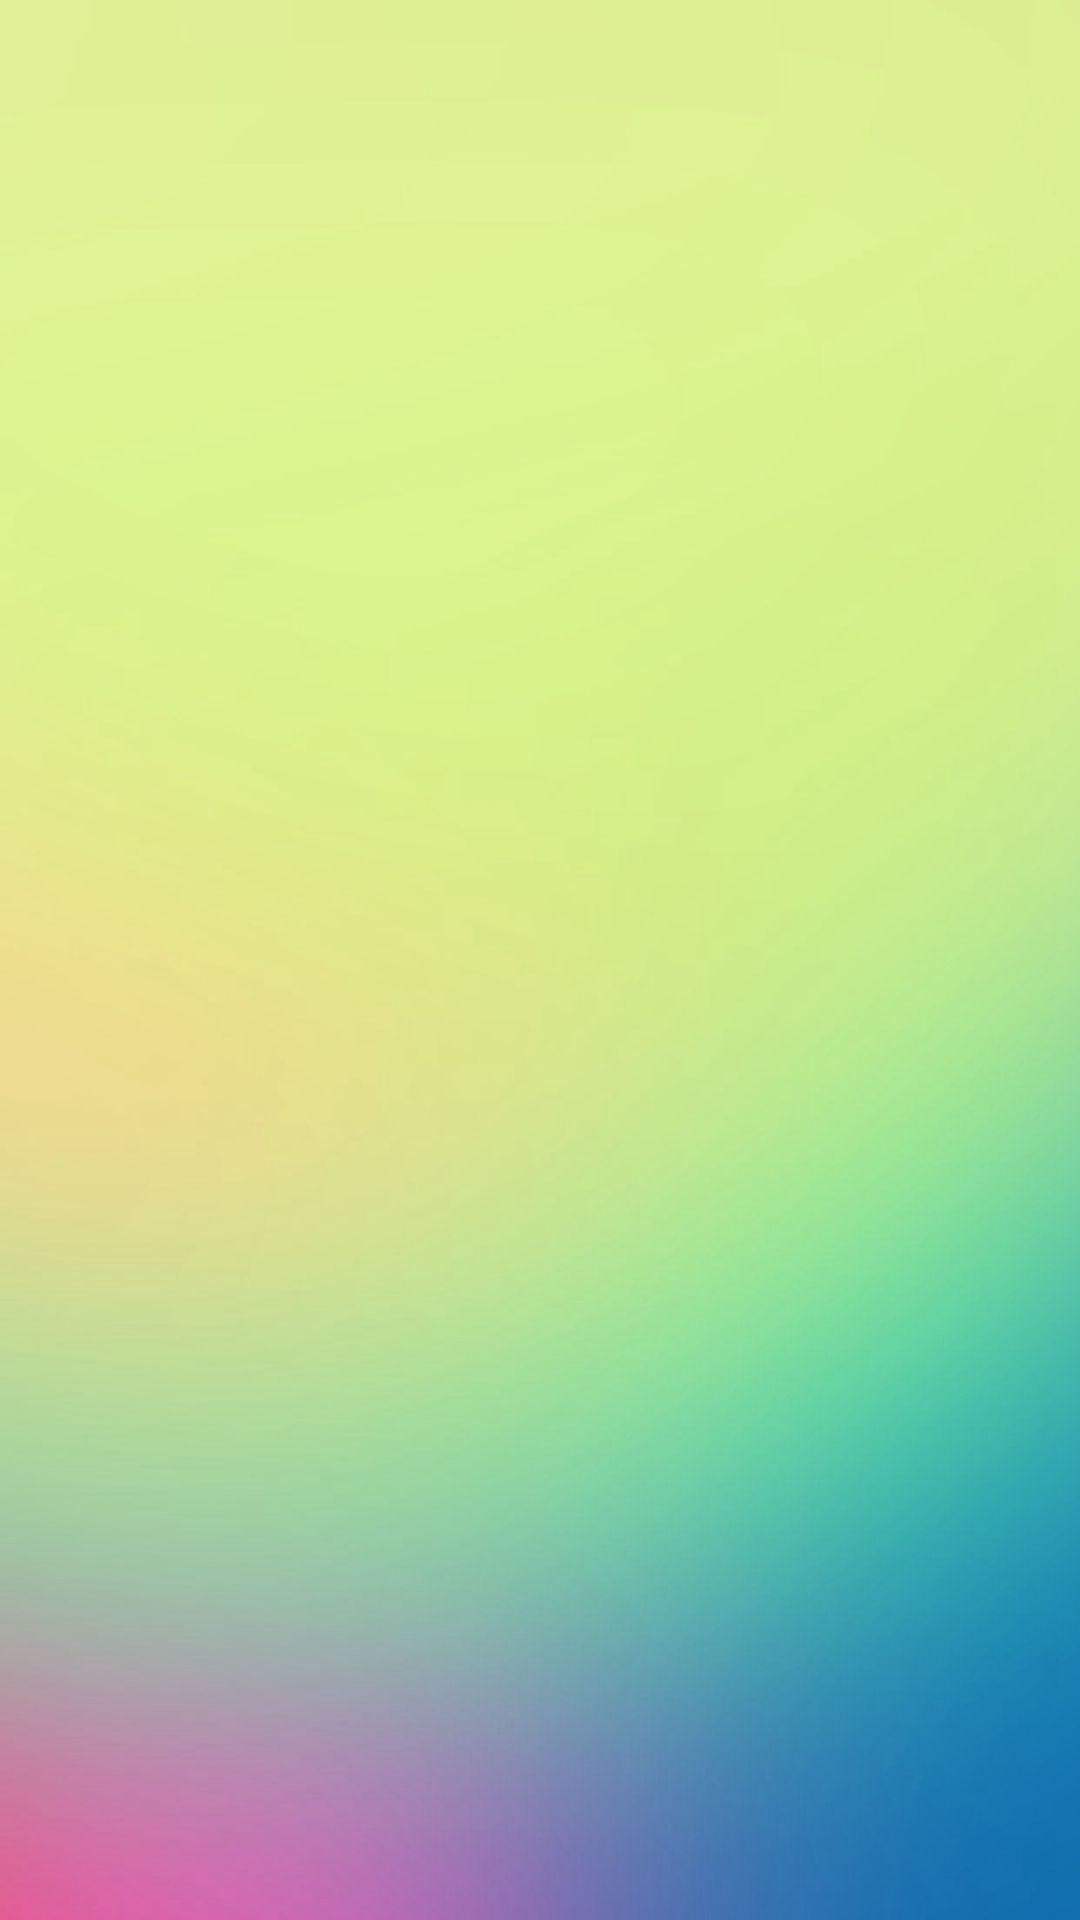 Morning Light Green Gradation Blur iPhone 6 plus